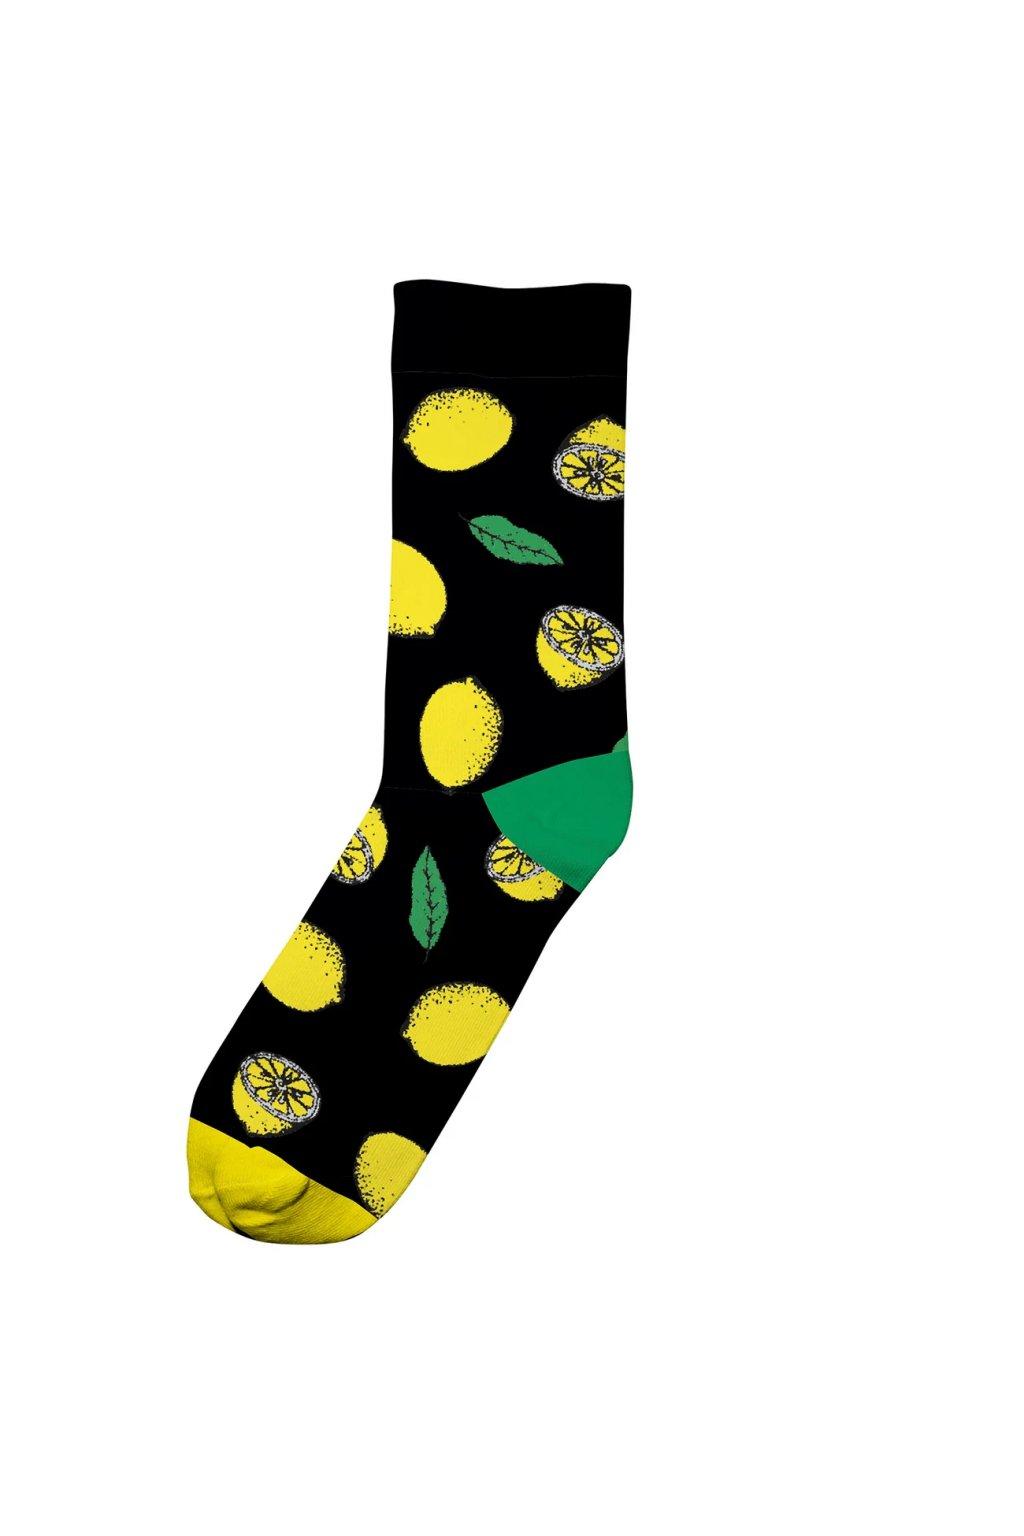 sigtuna lemons1